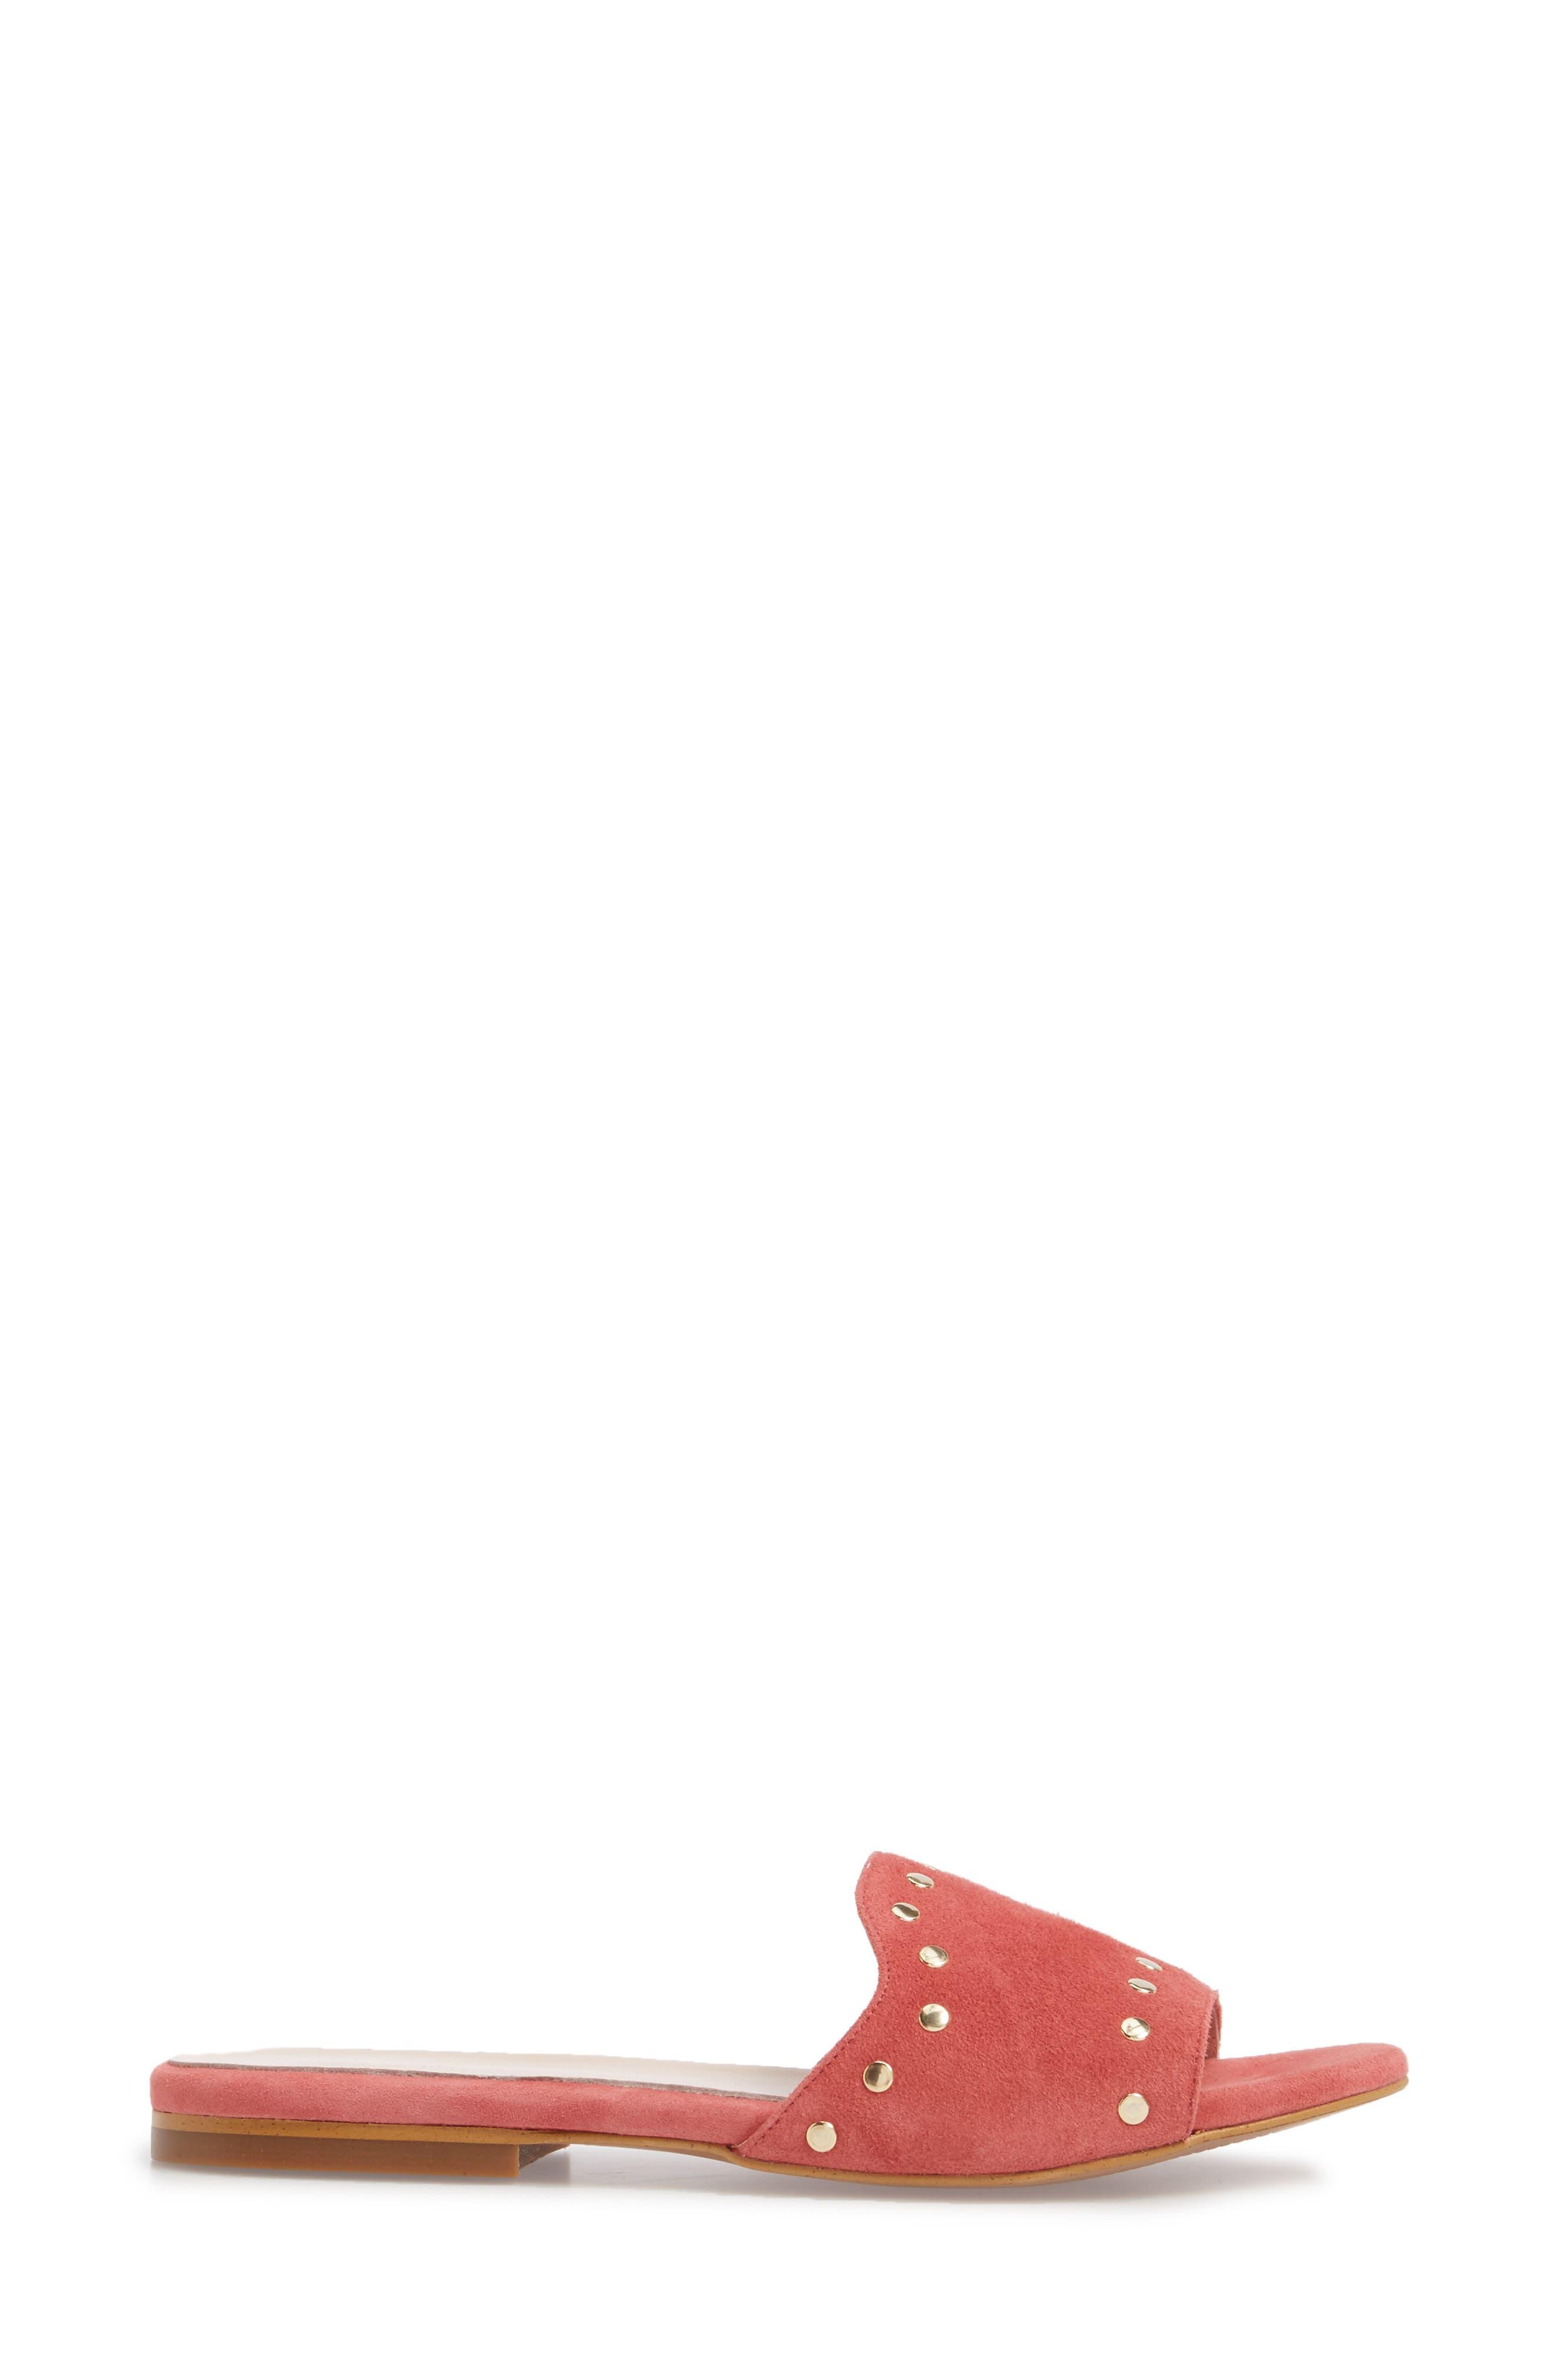 Mira Slide Sandal,                             Alternate thumbnail 3, color,                             Rose Suede